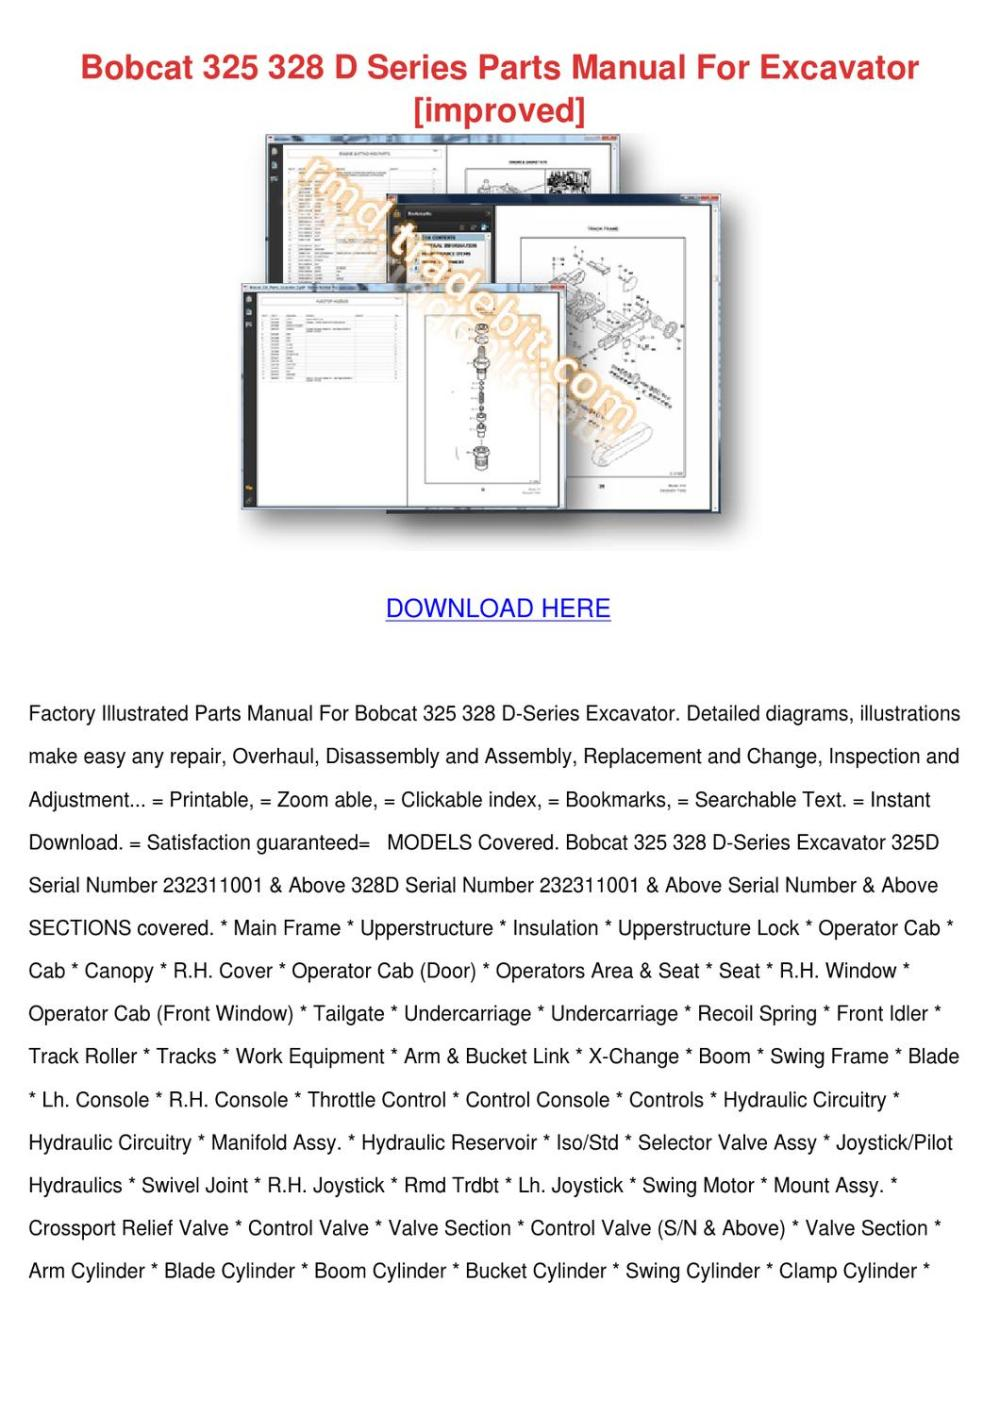 medium resolution of bobcat 325 328 d series parts manual for exca